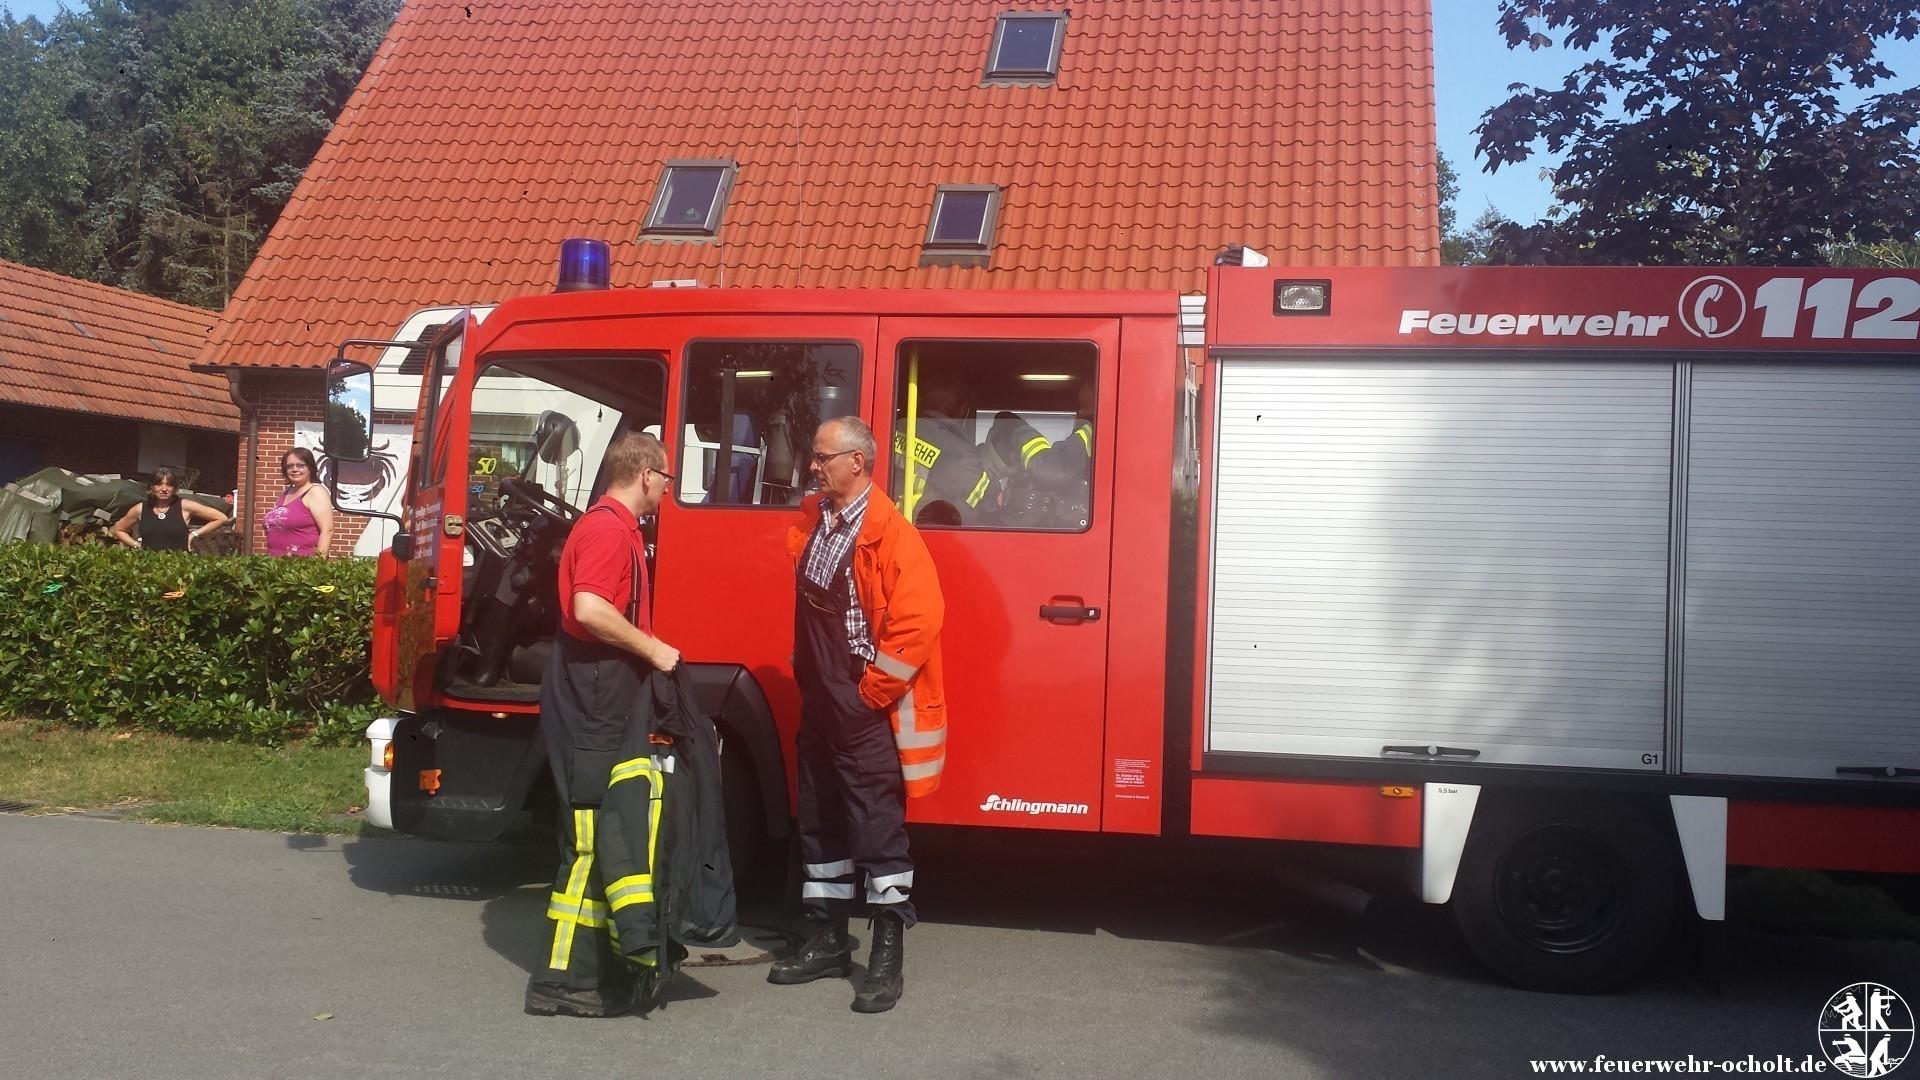 12.07.2014 um 16:26 Uhr – Flächenbrand Hochkamp